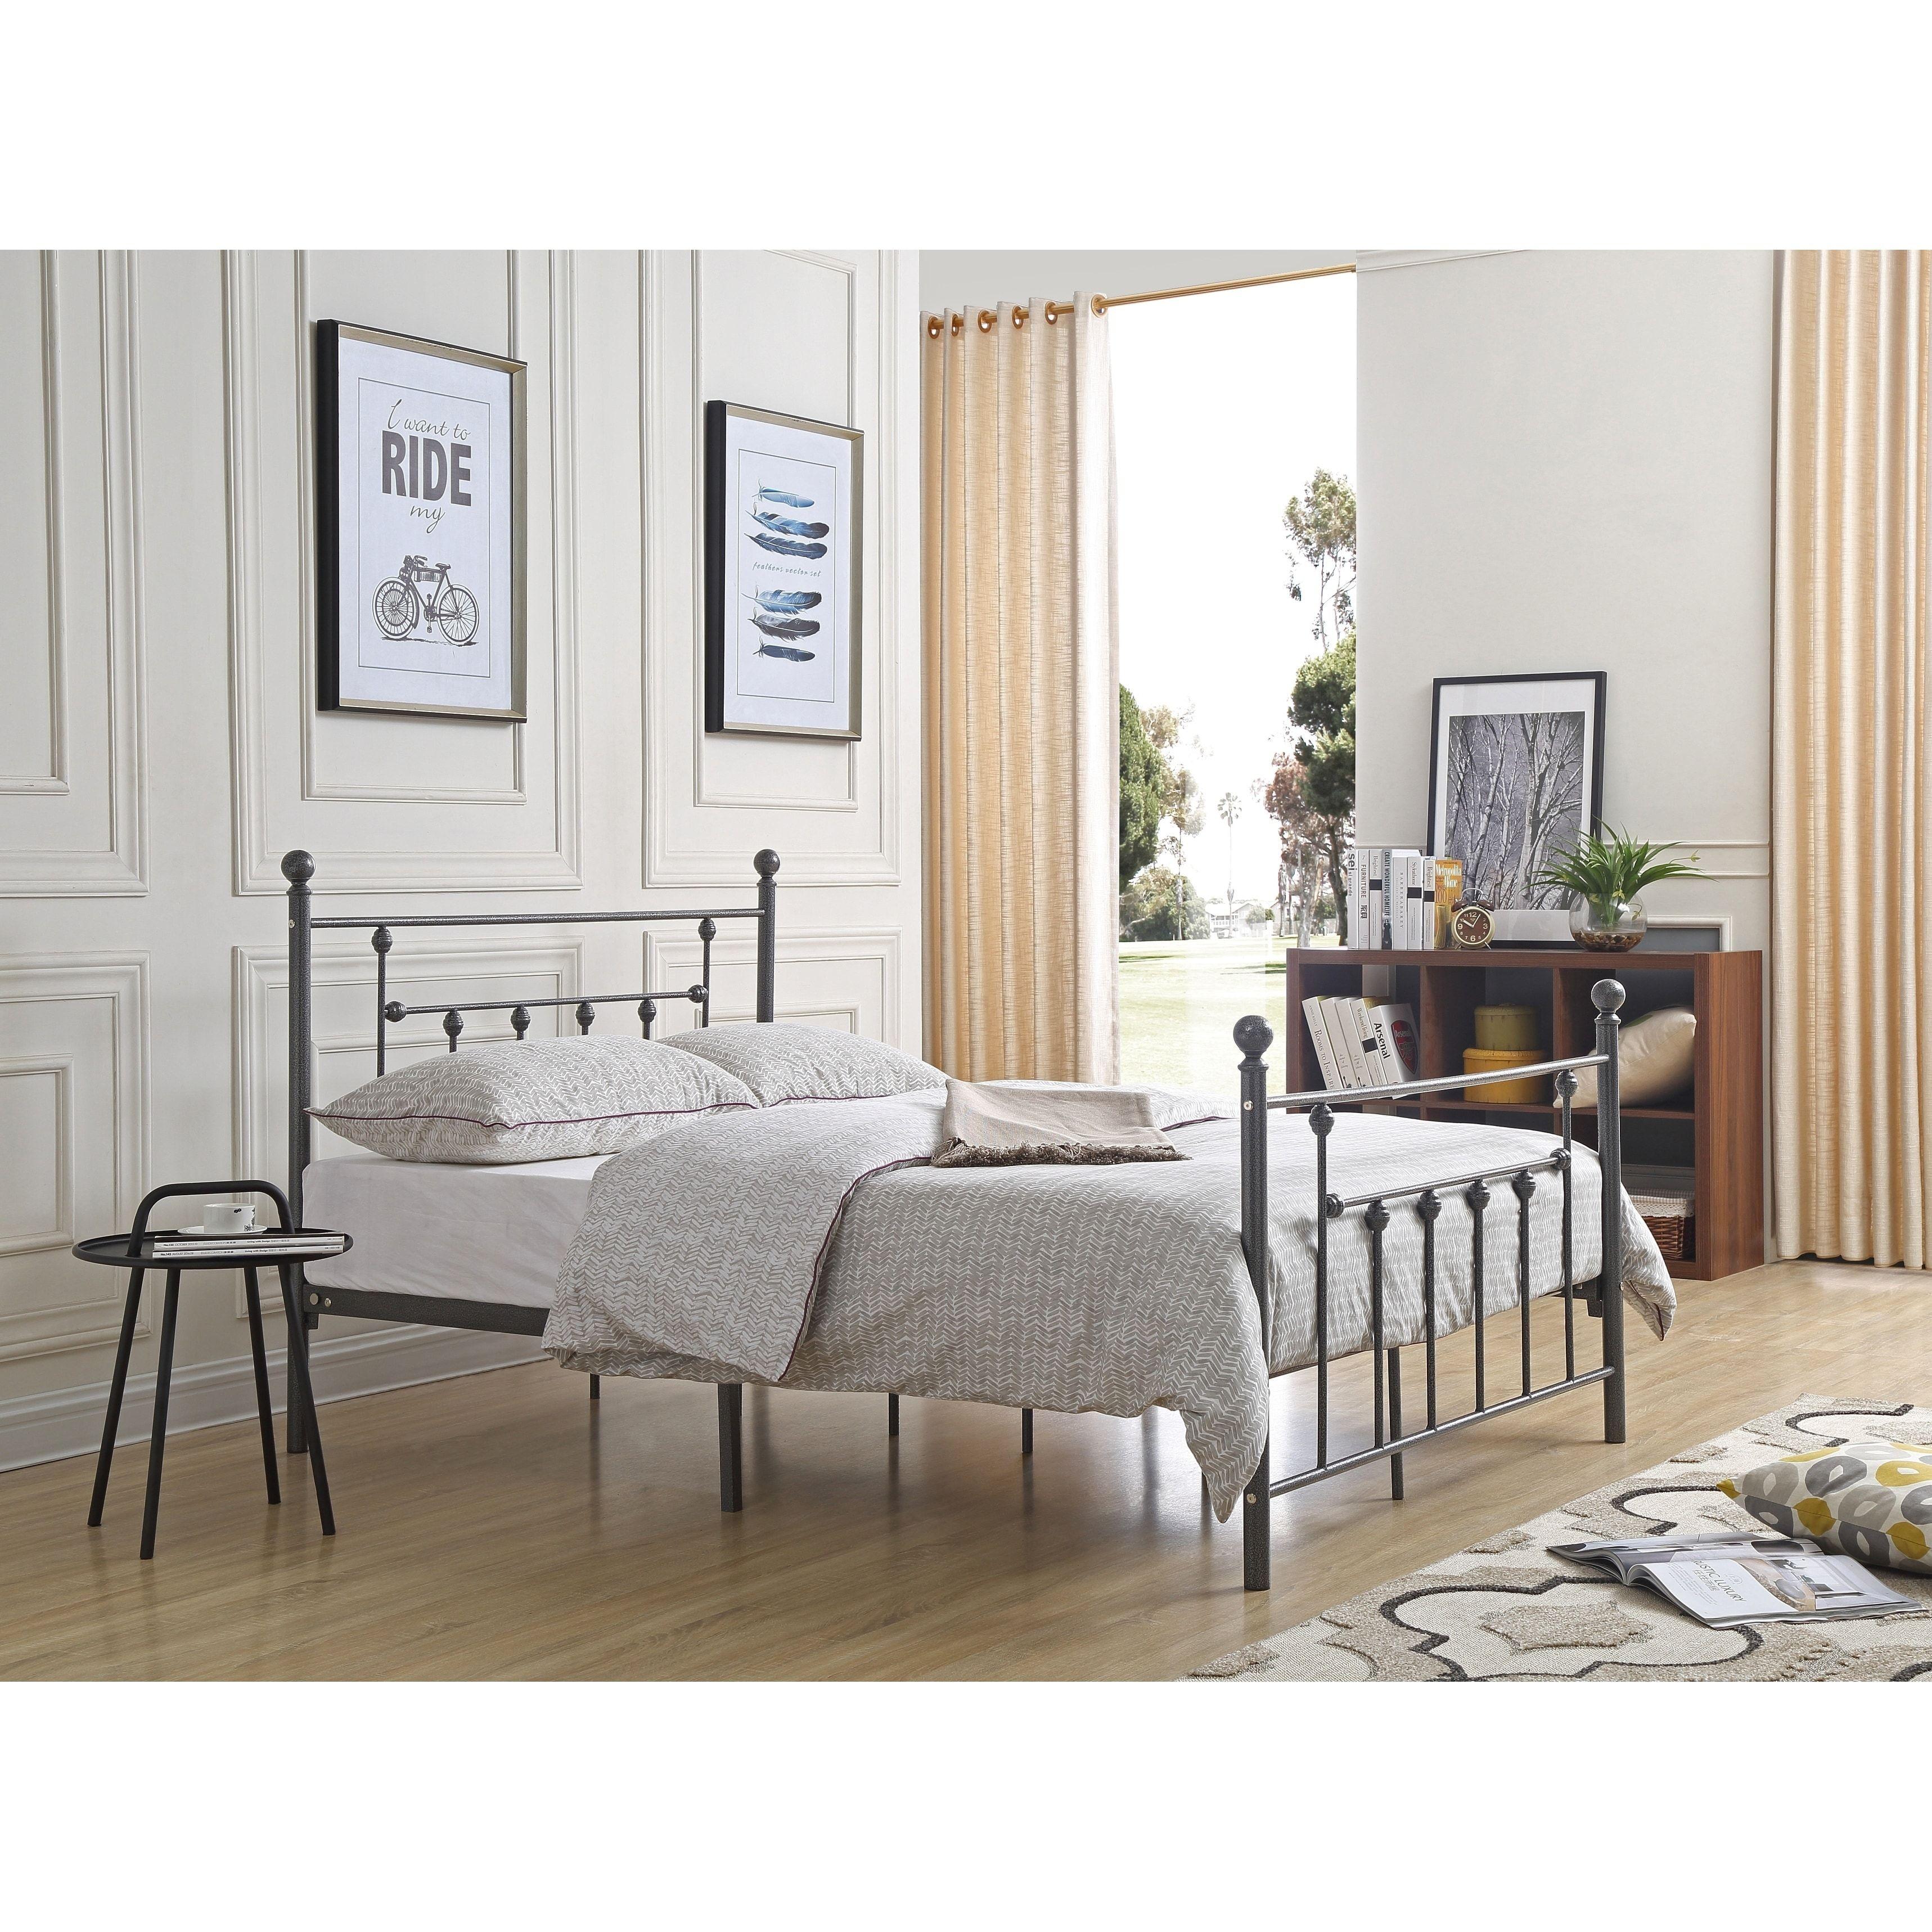 hodedah imports metal poster bed beds